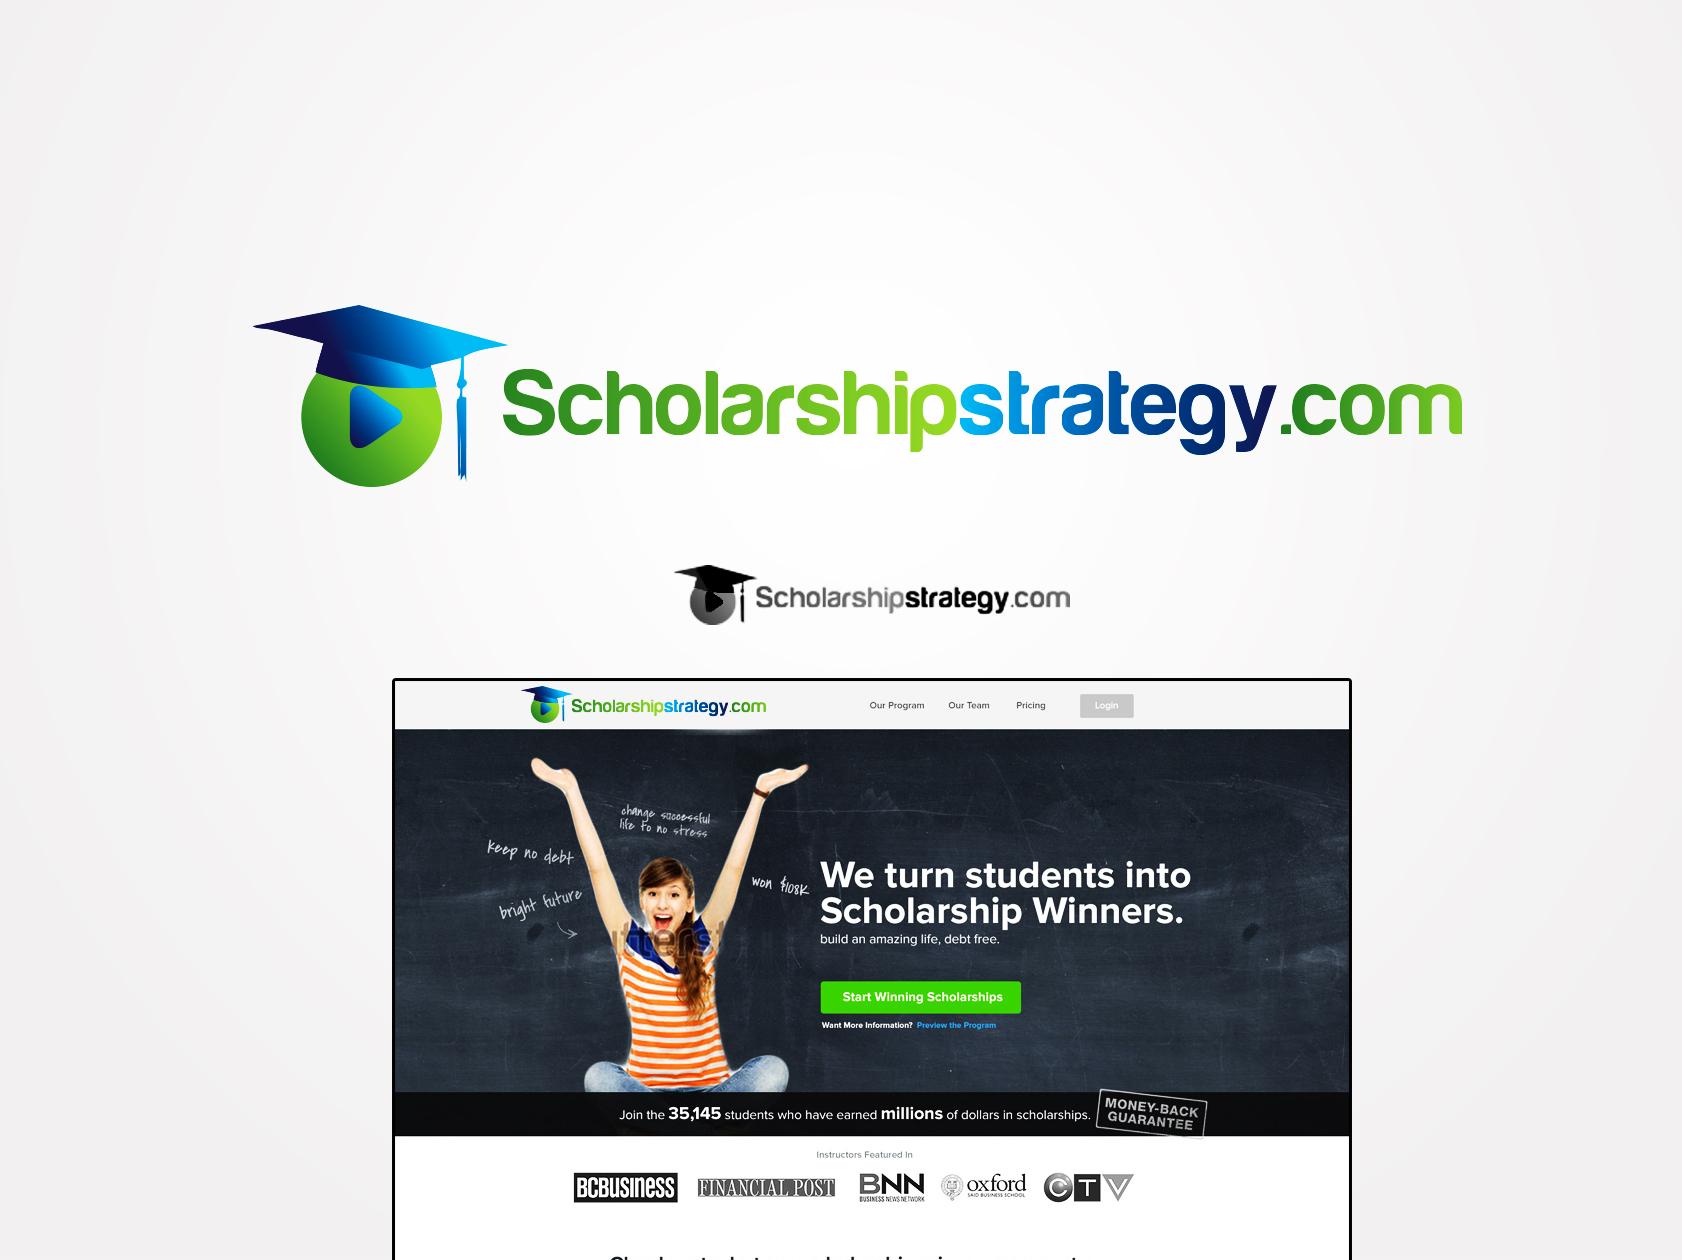 Logo Design by Mythos Designs - Entry No. 144 in the Logo Design Contest Captivating Logo Design for Scholarshipstrategy.com.